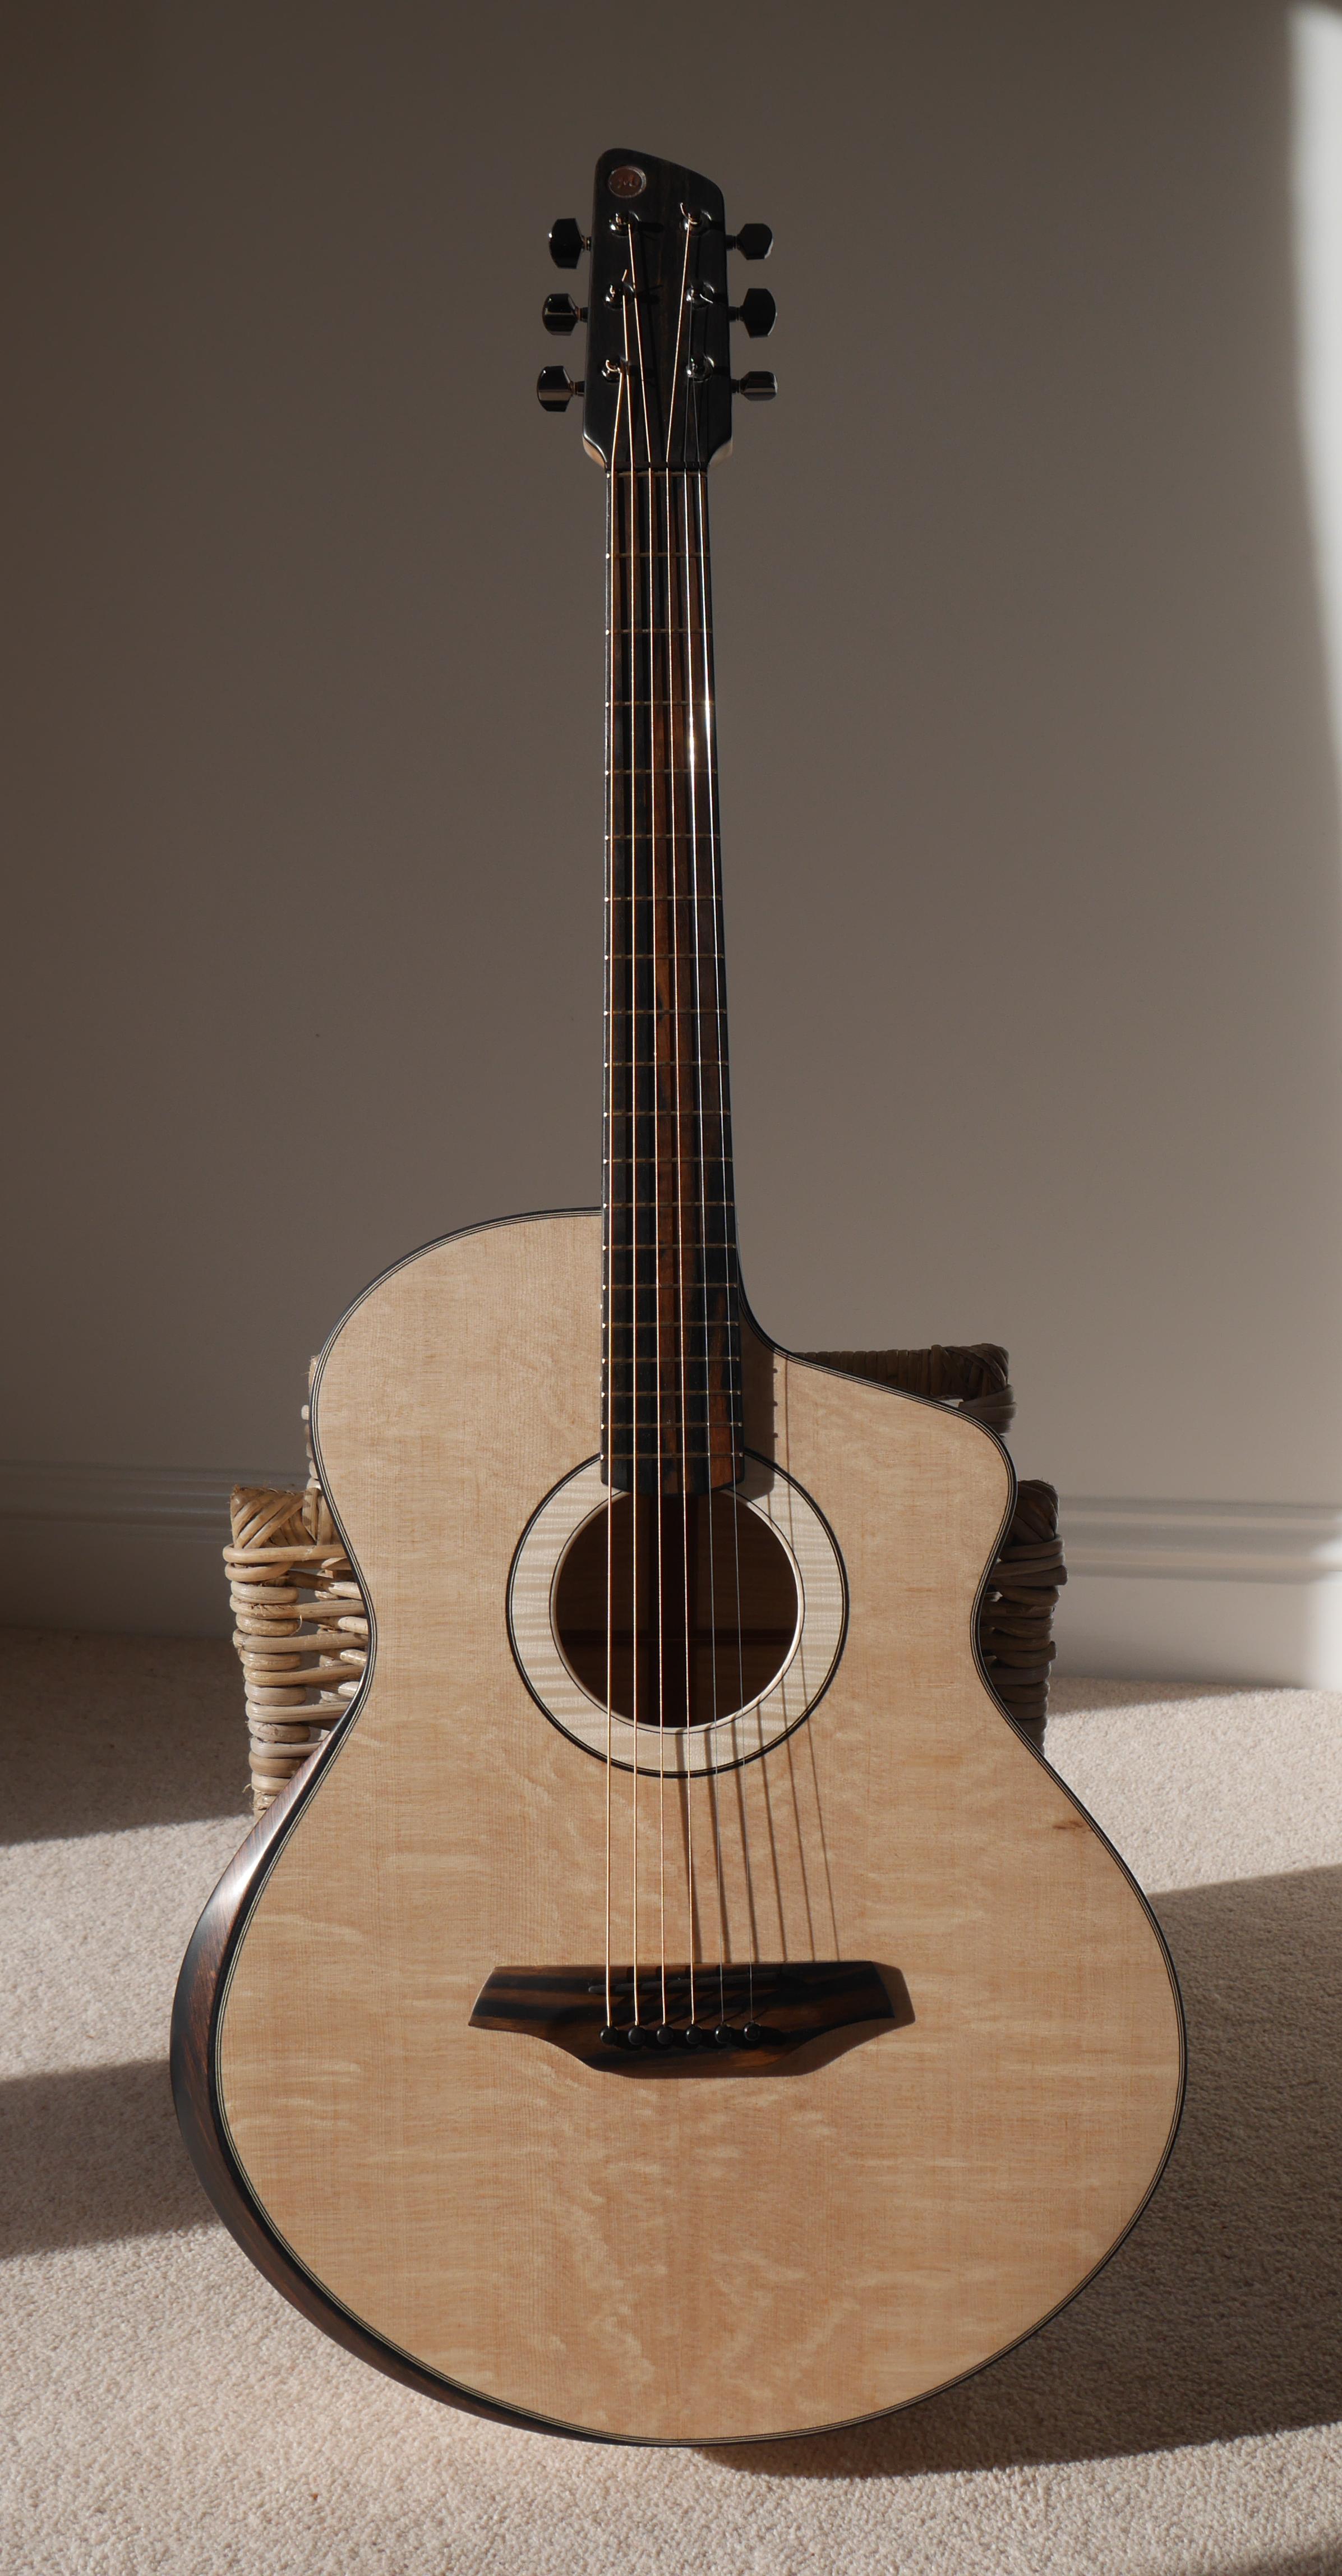 montgomery jumbo, montgomery guitar, 12th fret, bear claw, handmade, montgomery